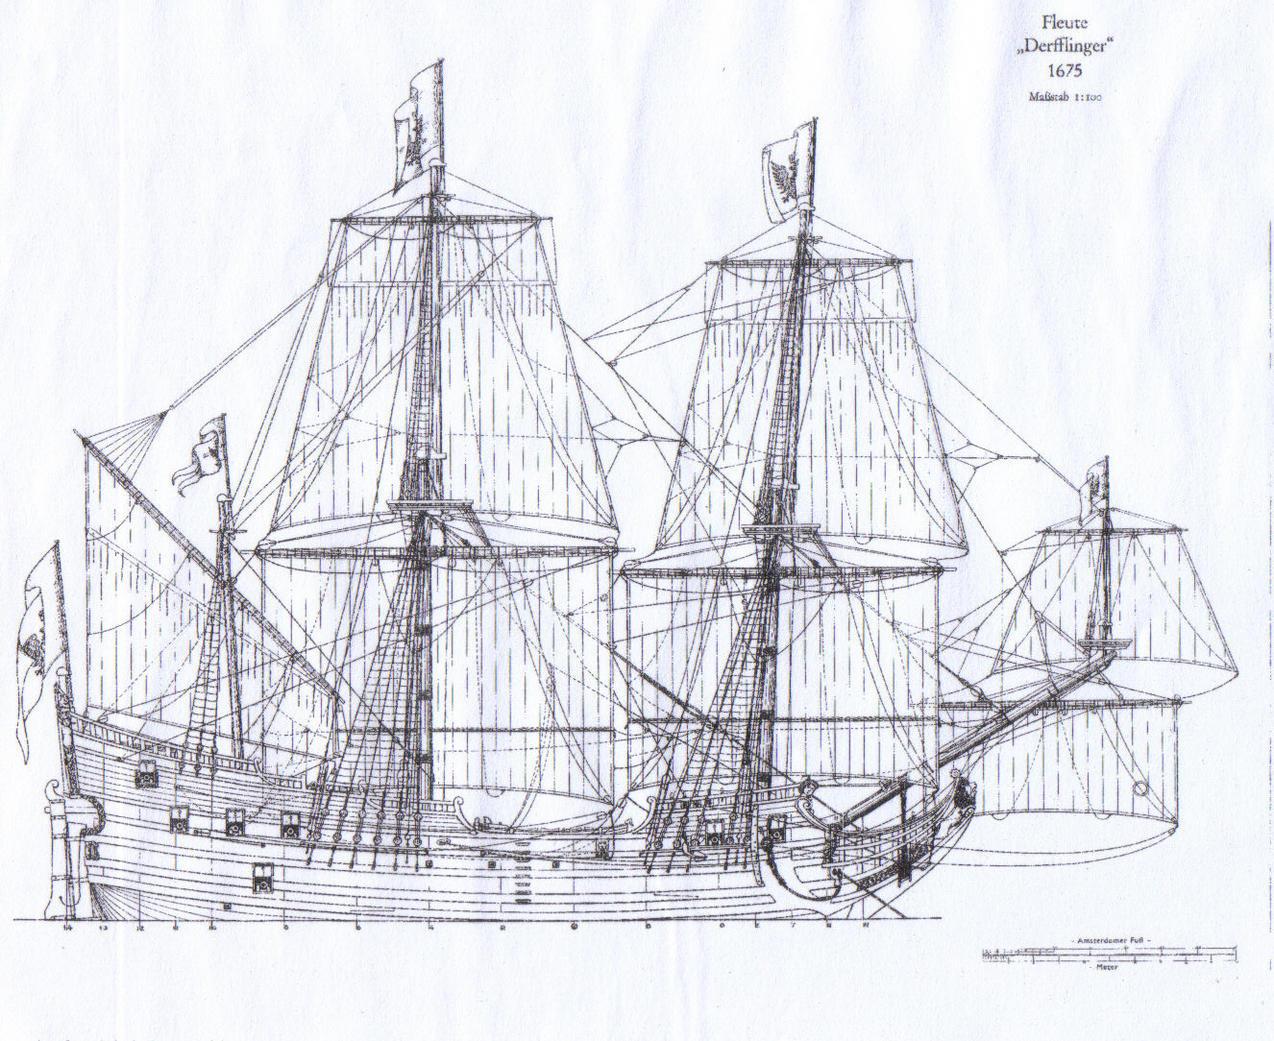 Drawn ship fluit Trading Dutch 30 Fluyt3